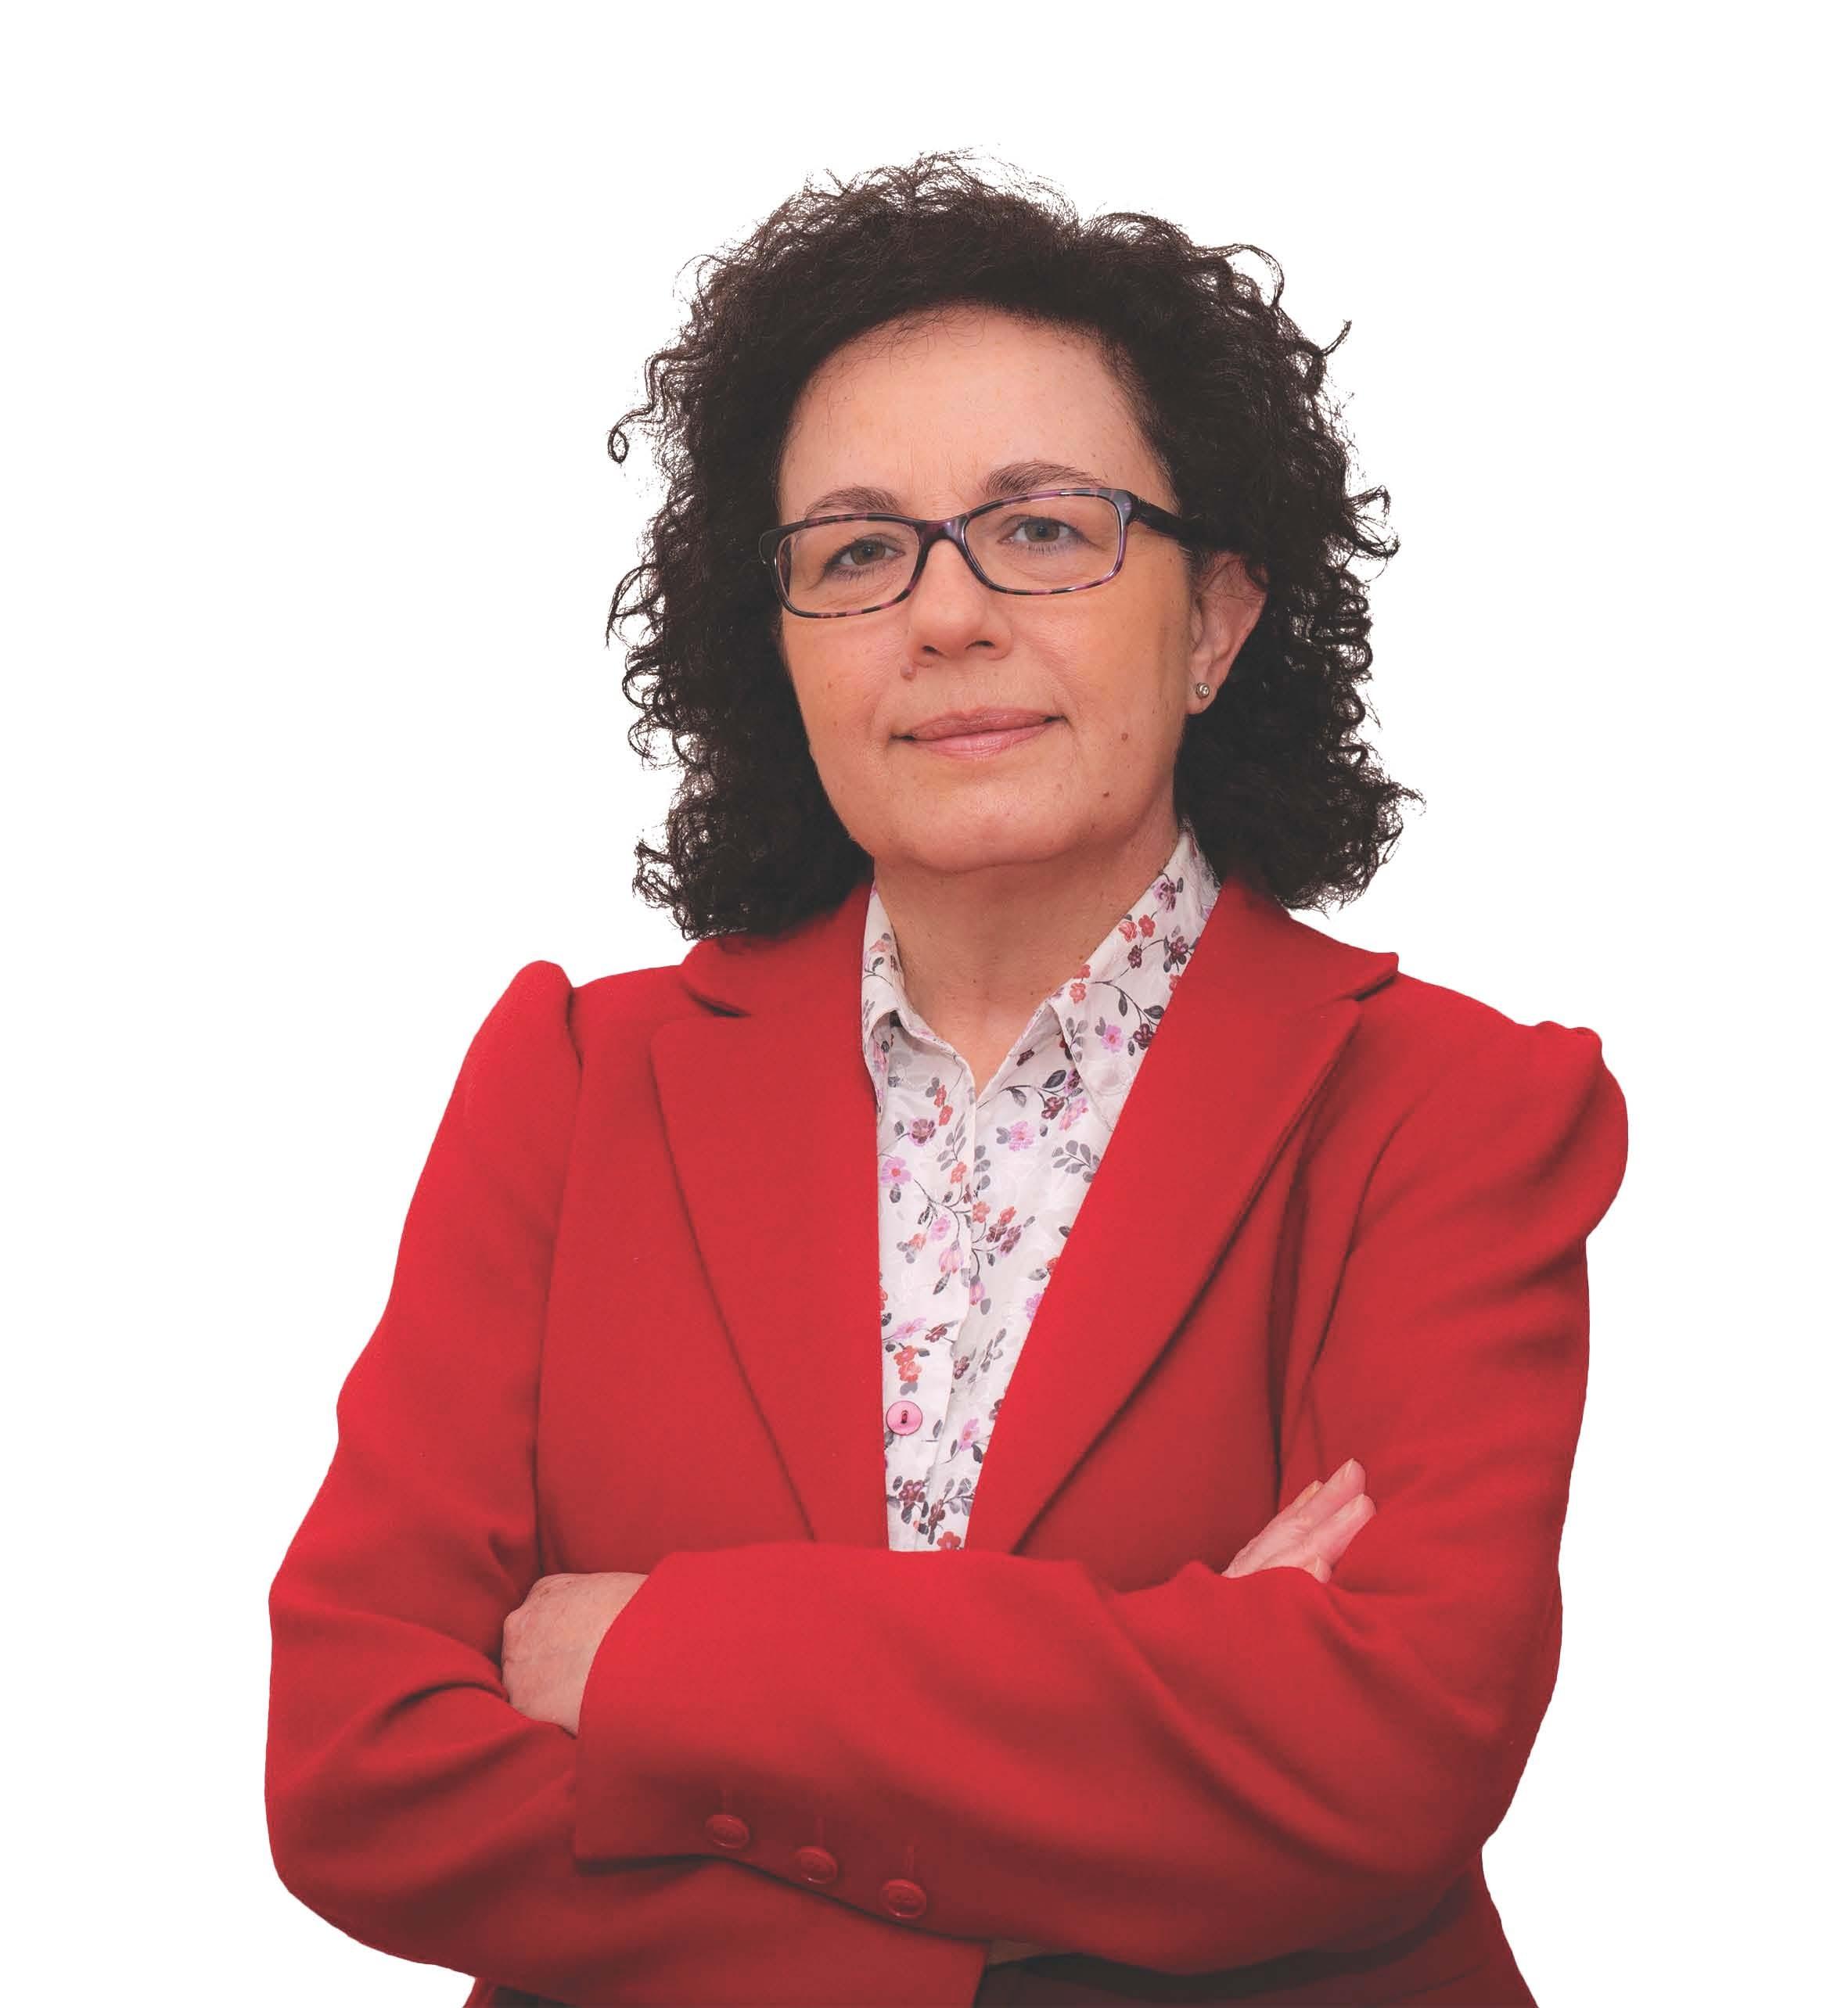 Isabel Gonzalez Mateo